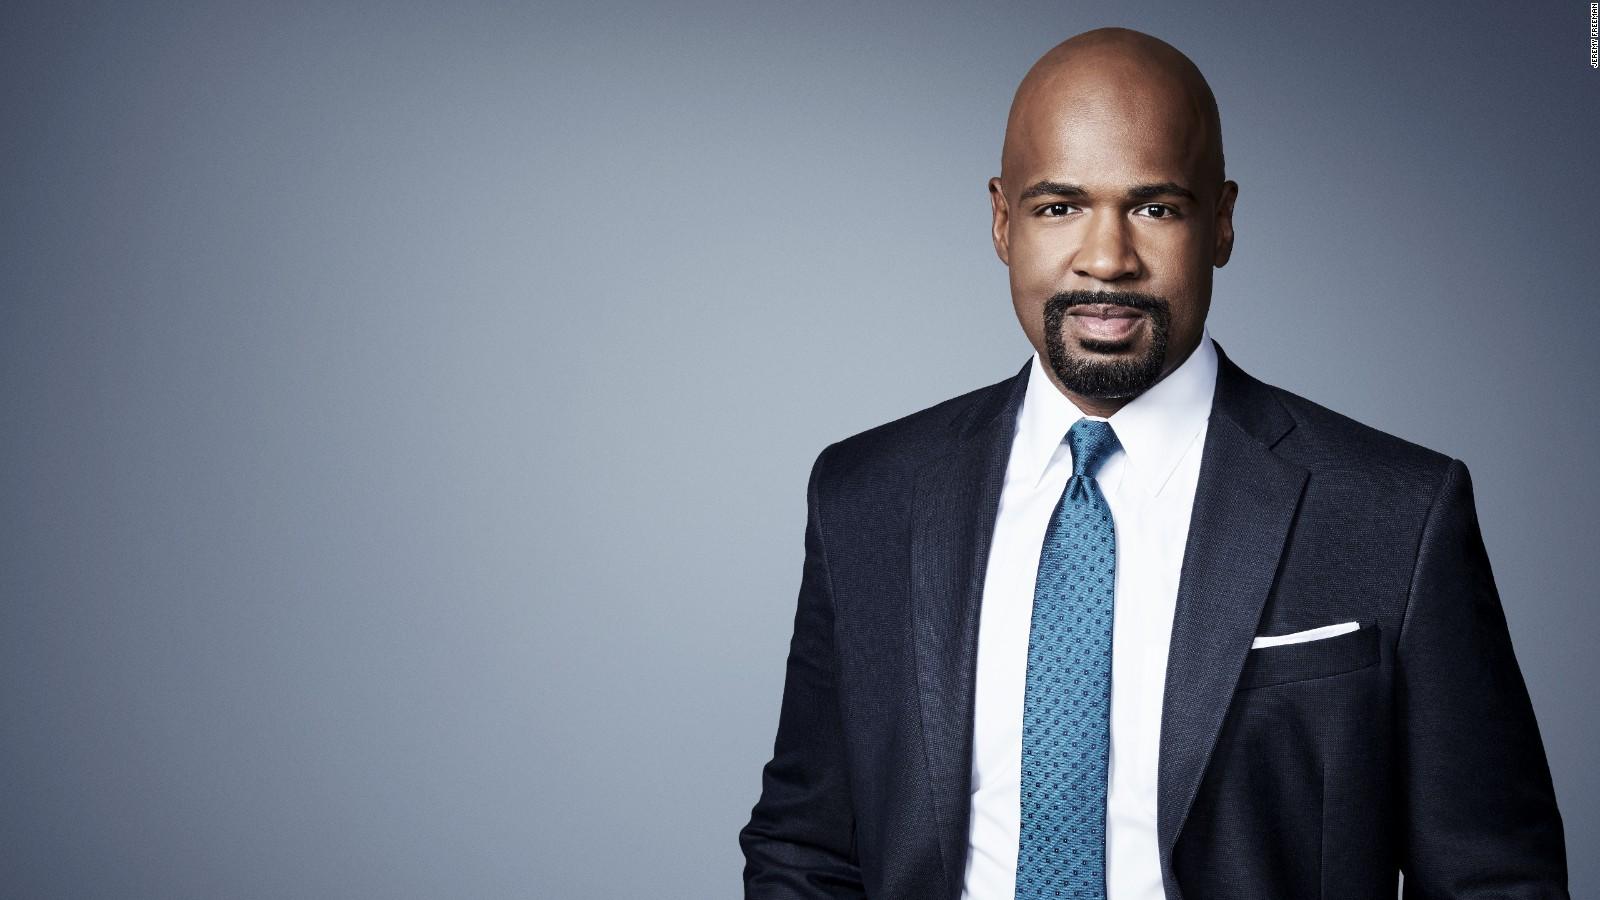 CNN Profiles - Victor Blackwell - Anchor and Correspondent - CNN